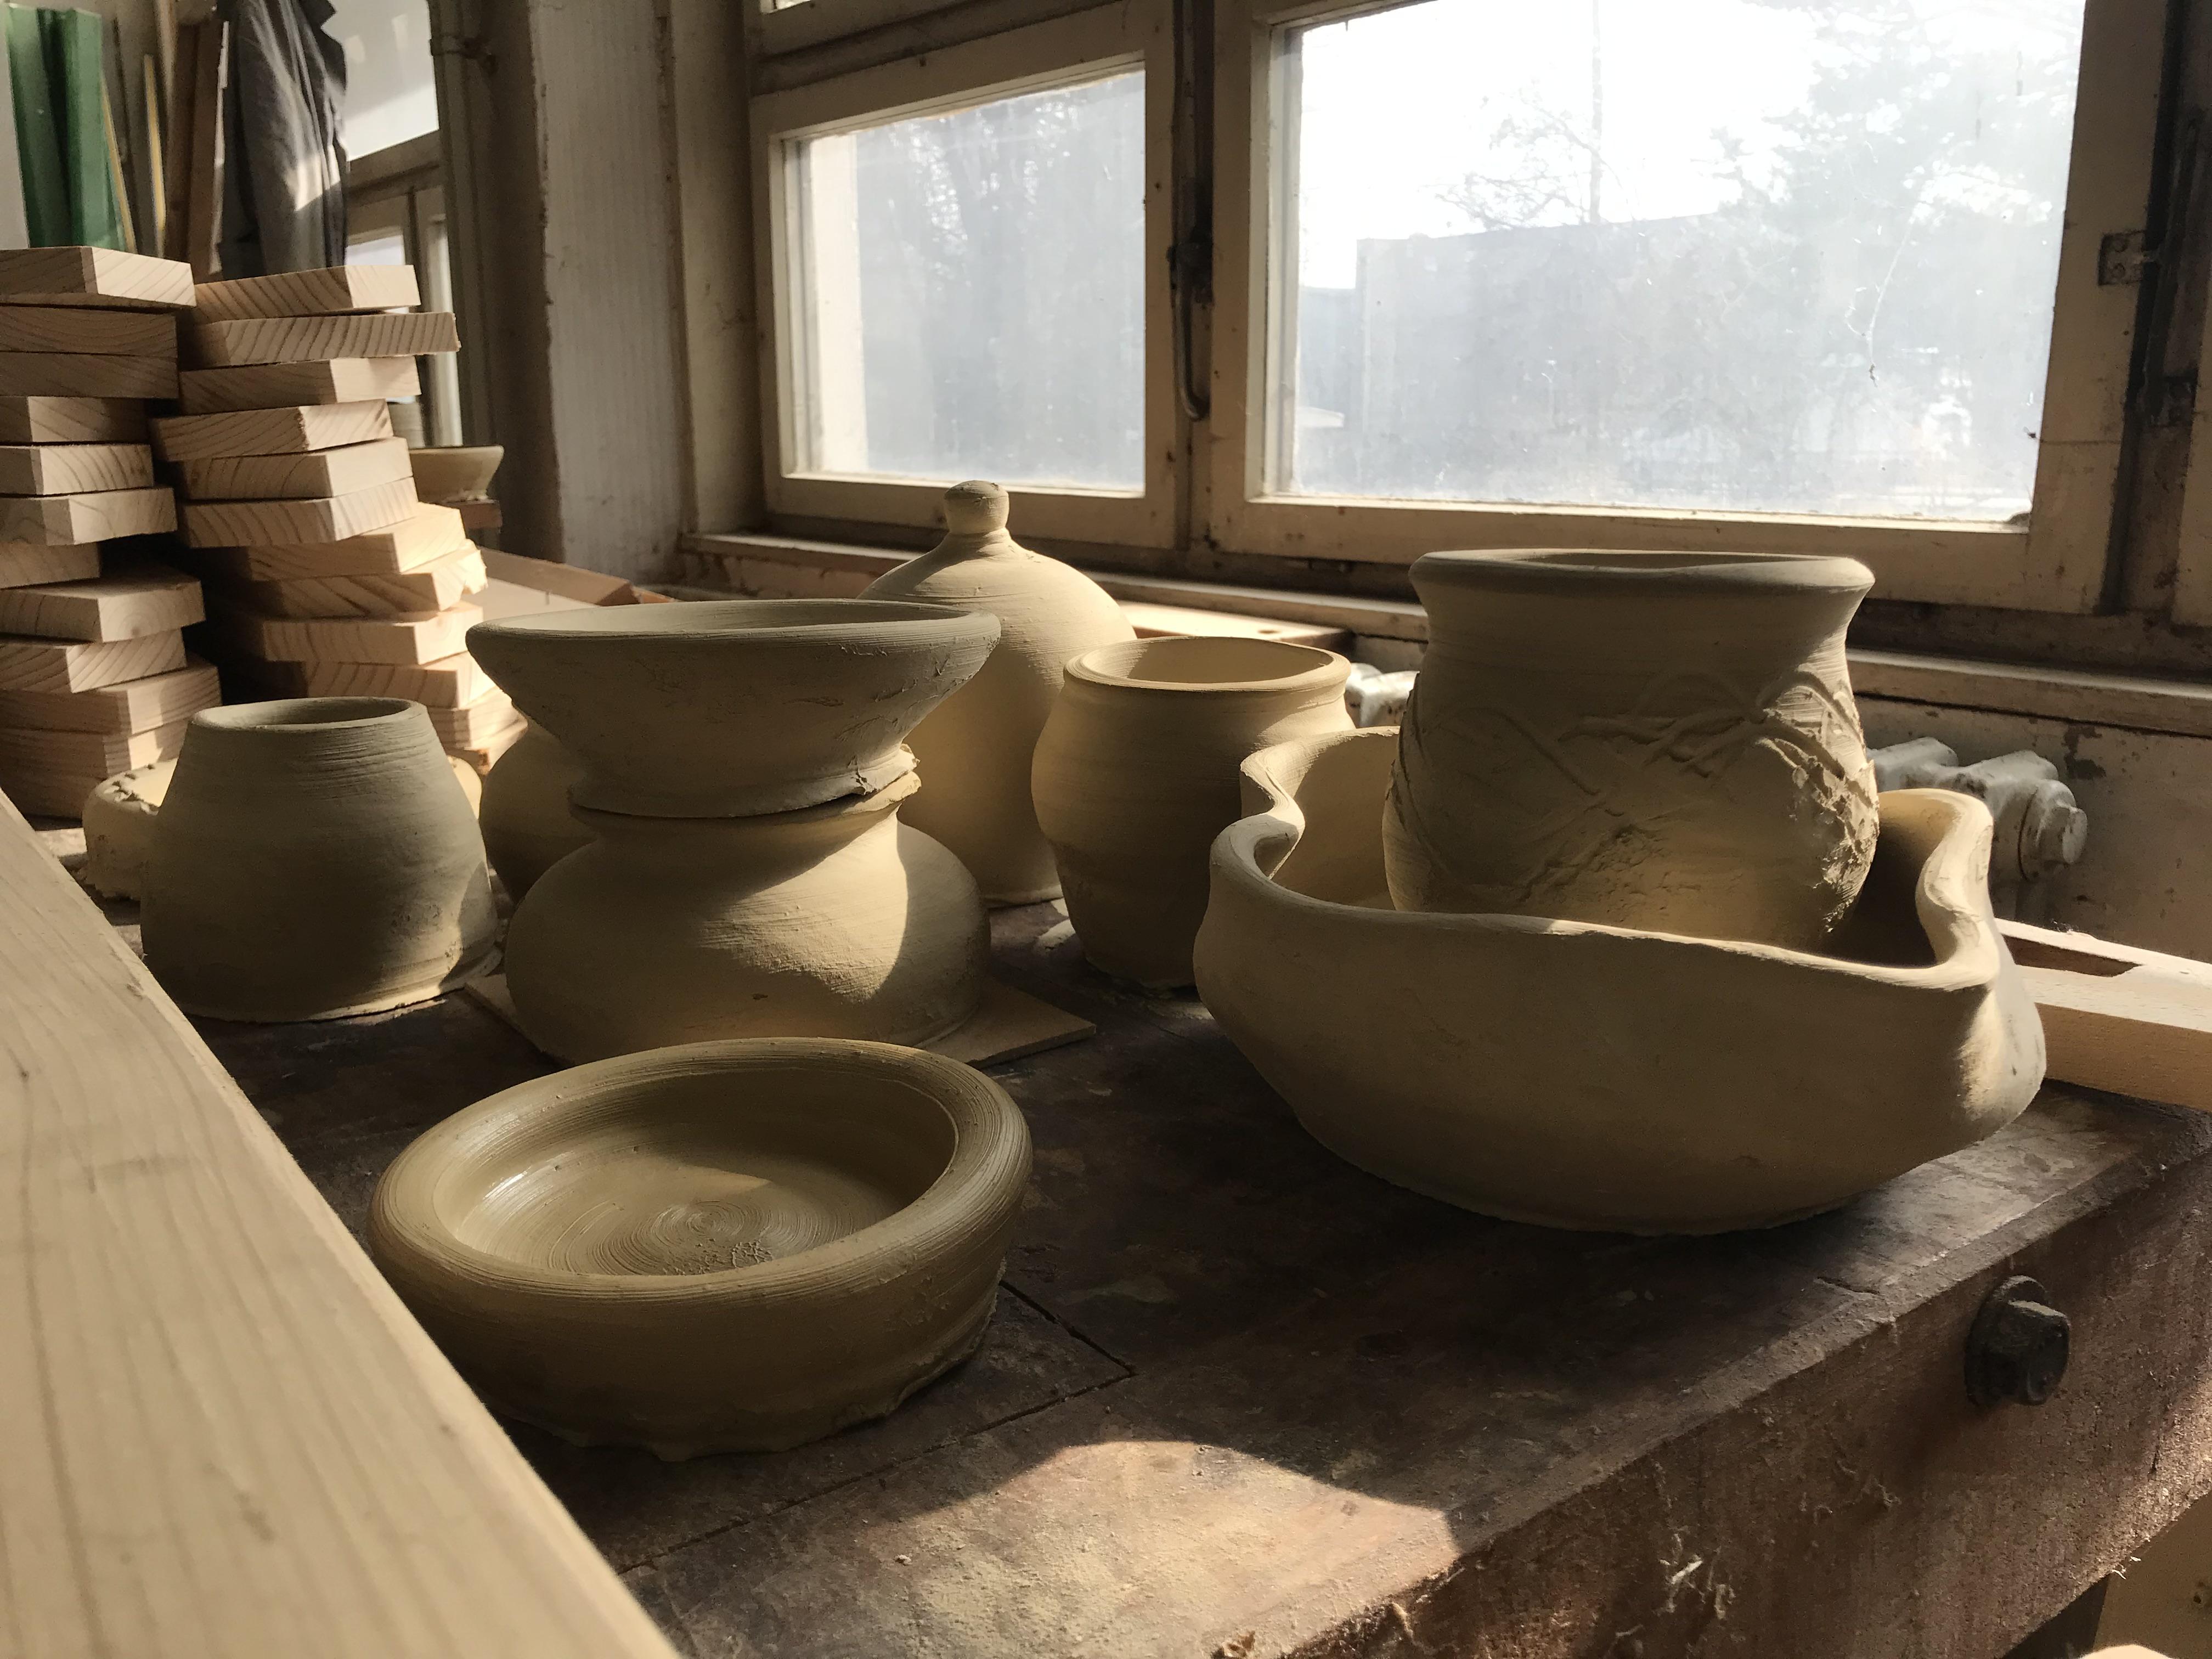 Mastering the pottery wheel